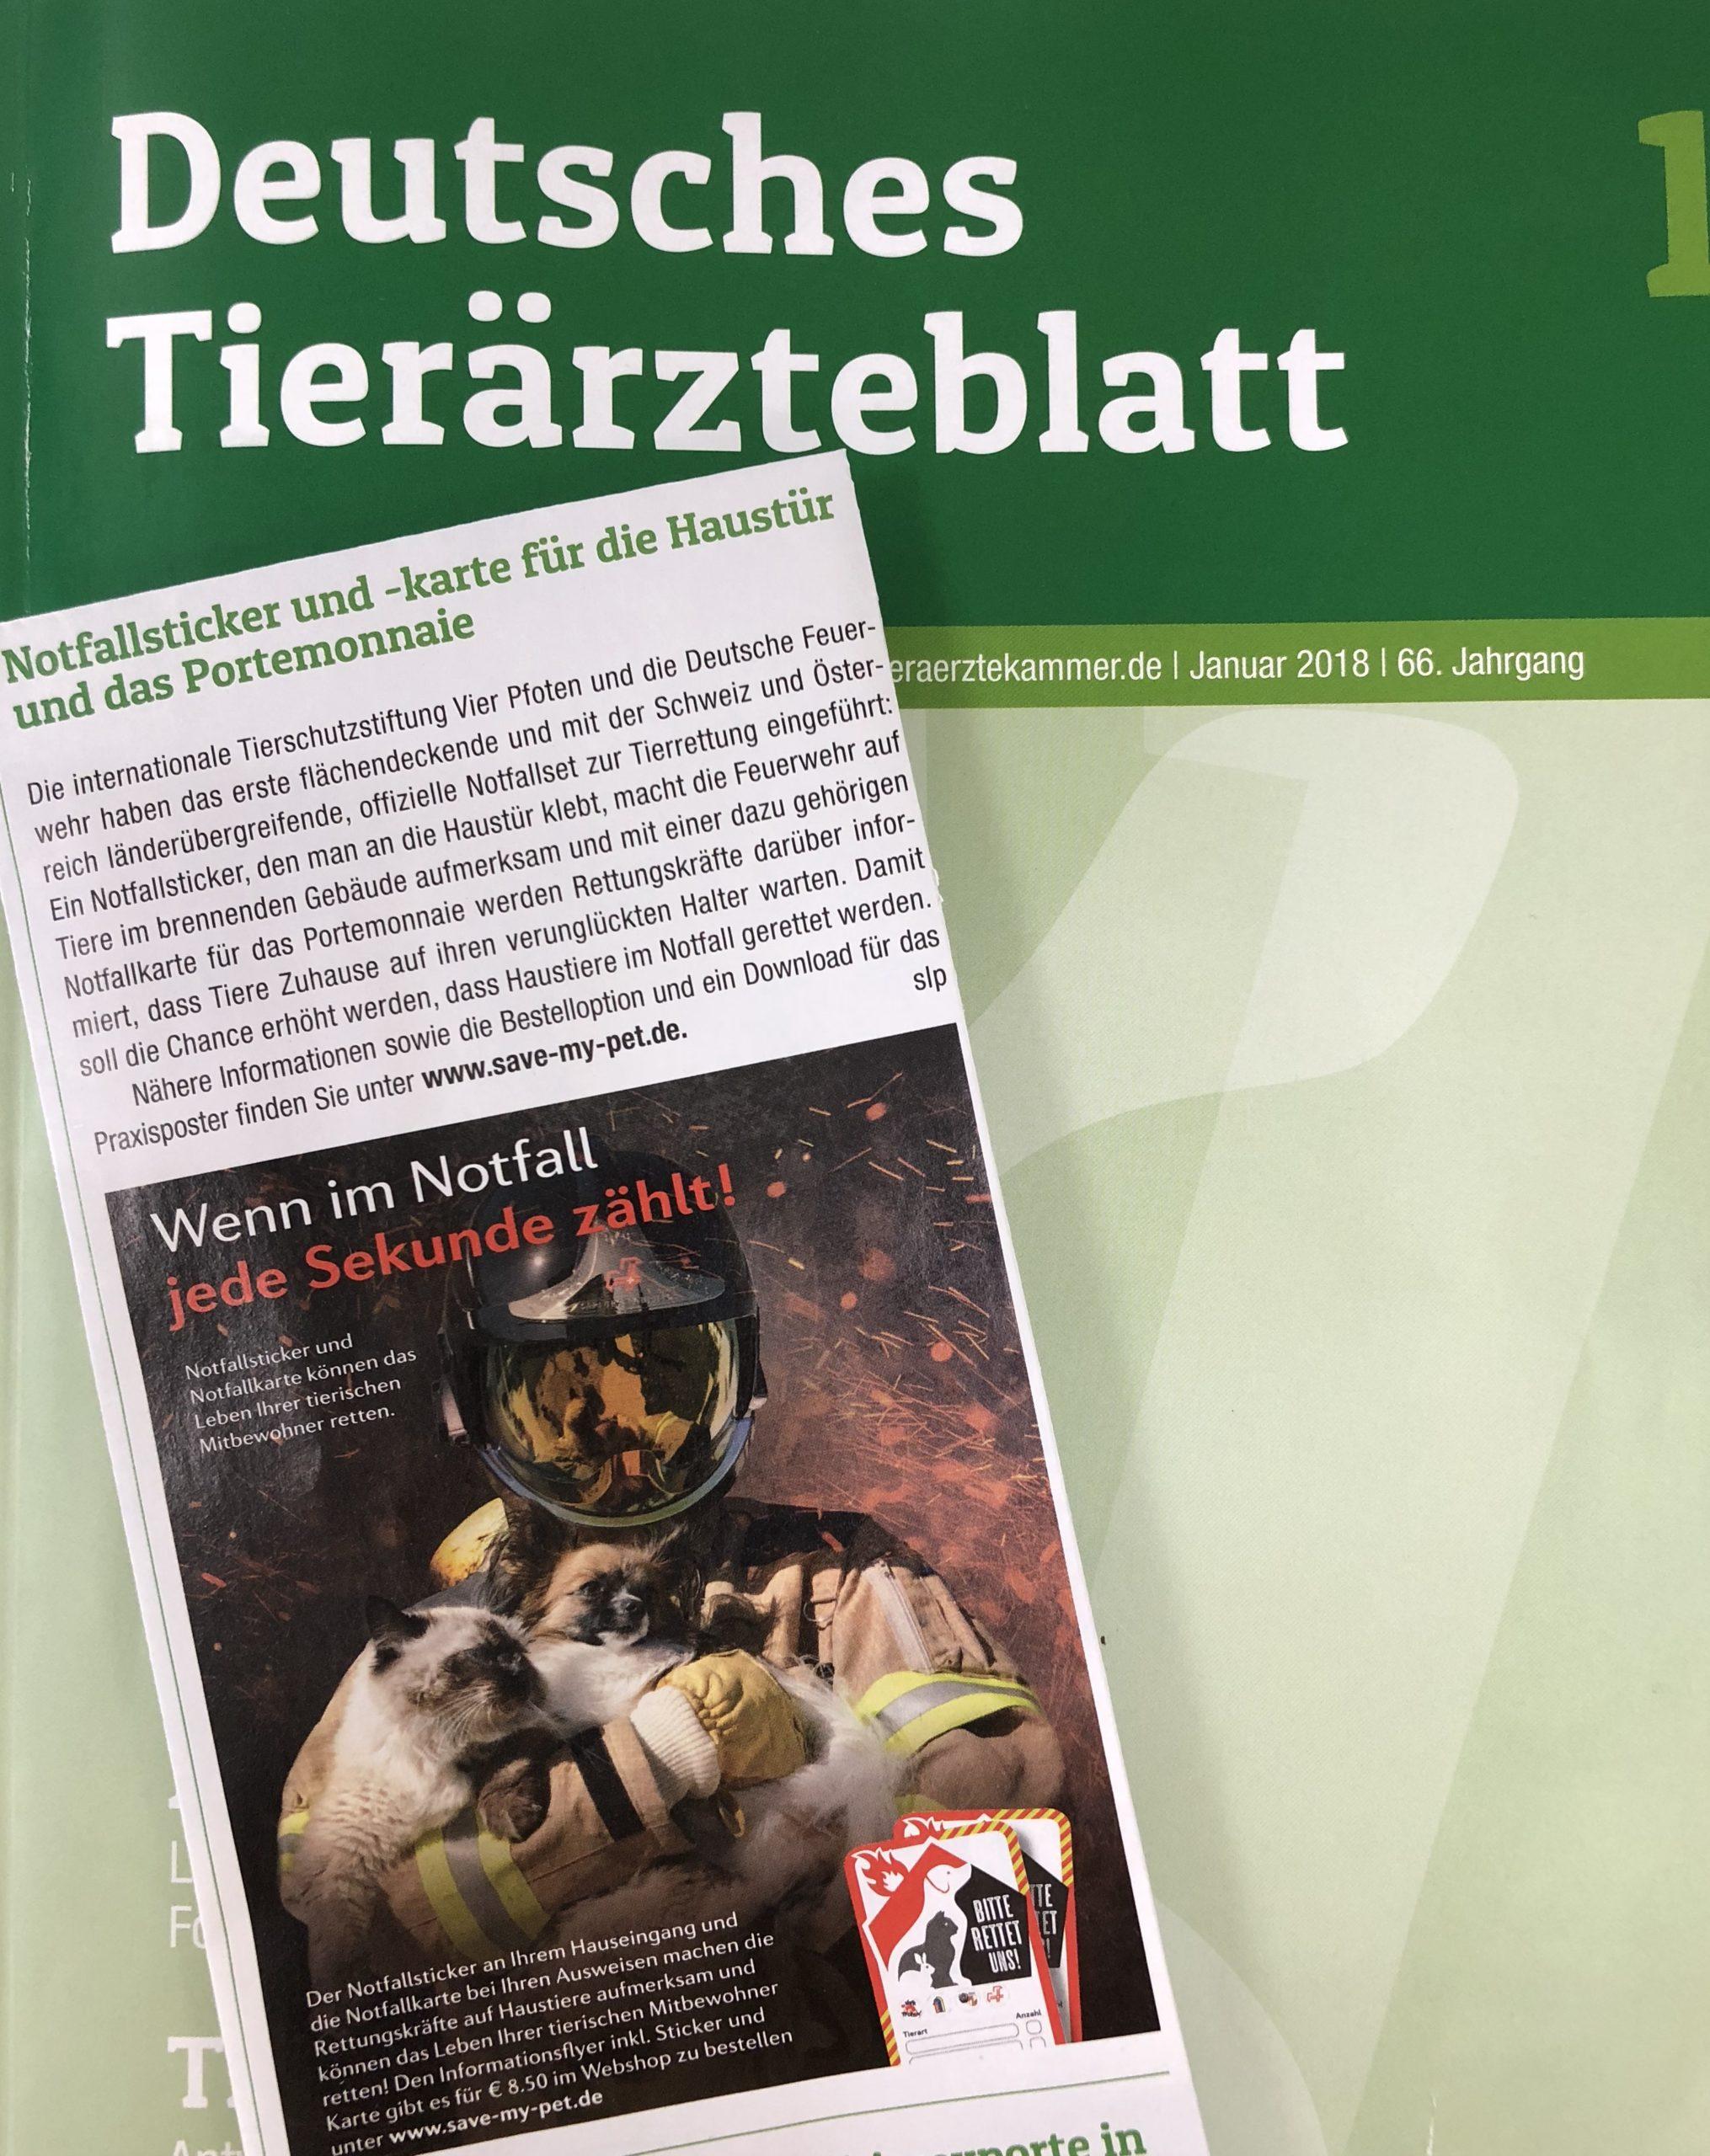 Deutsches Tierärzteblatt